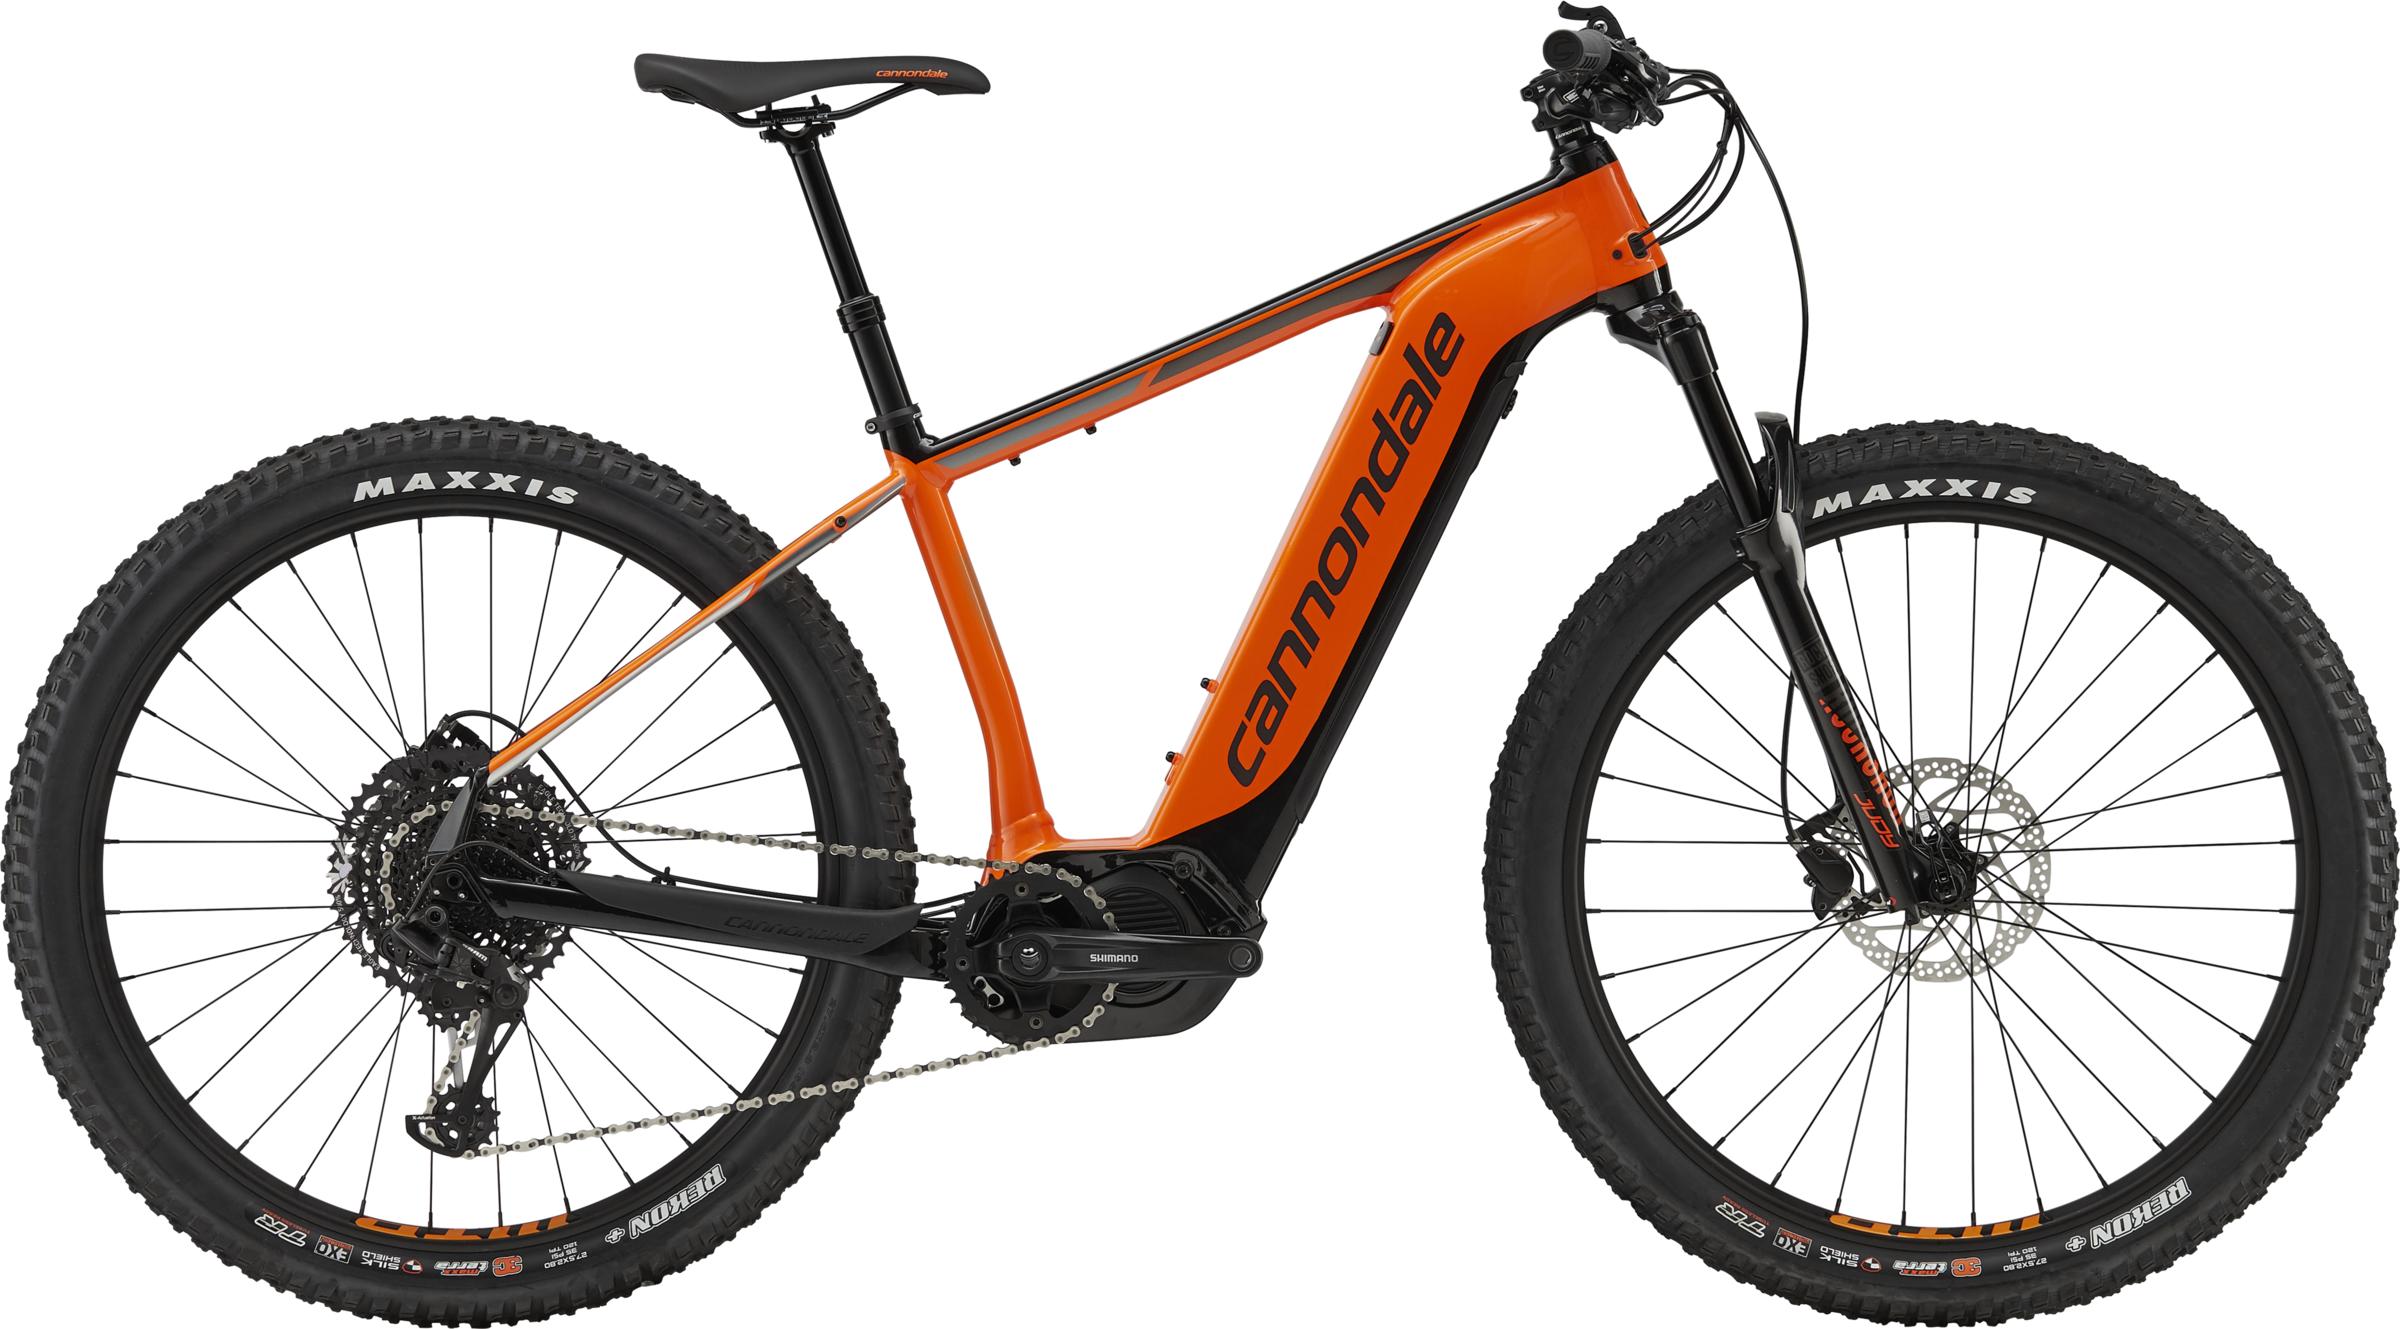 24 inch kids' bike